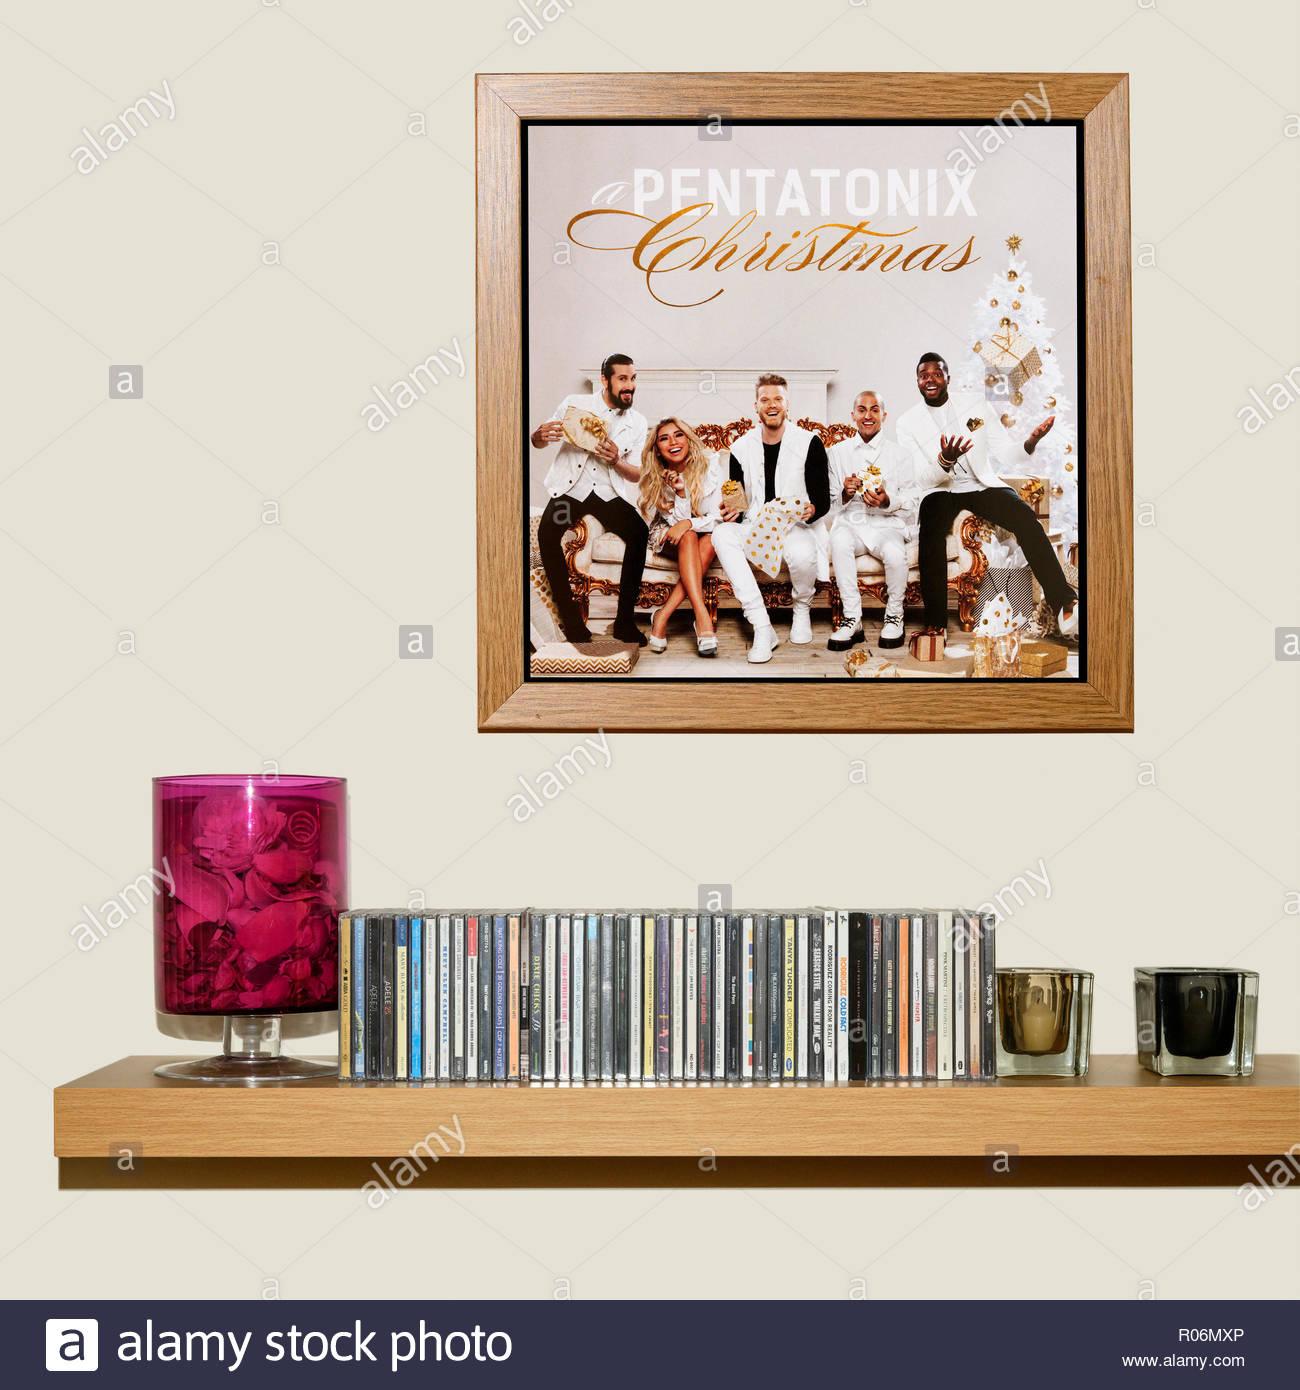 CD-Sammlung und gerahmten Pentatonix Album eine pentatonix ...